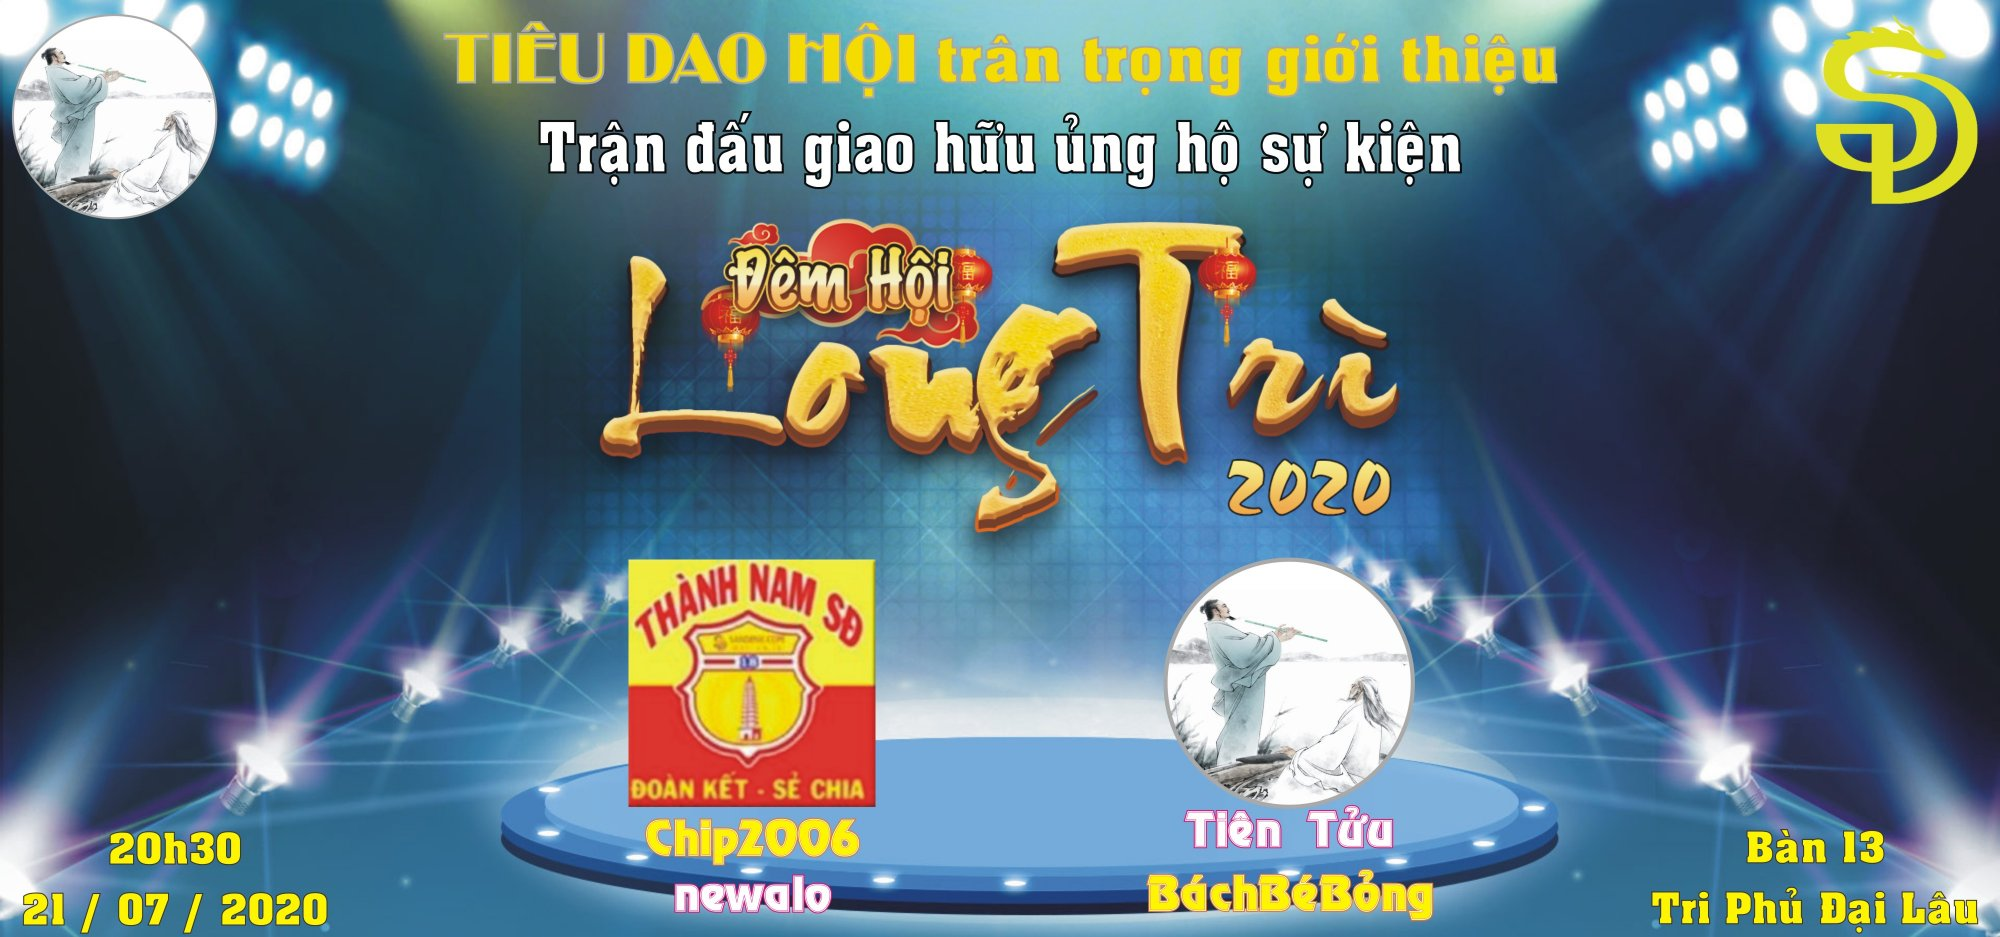 Tran 4 - TDH - Thanh Nam.JPG